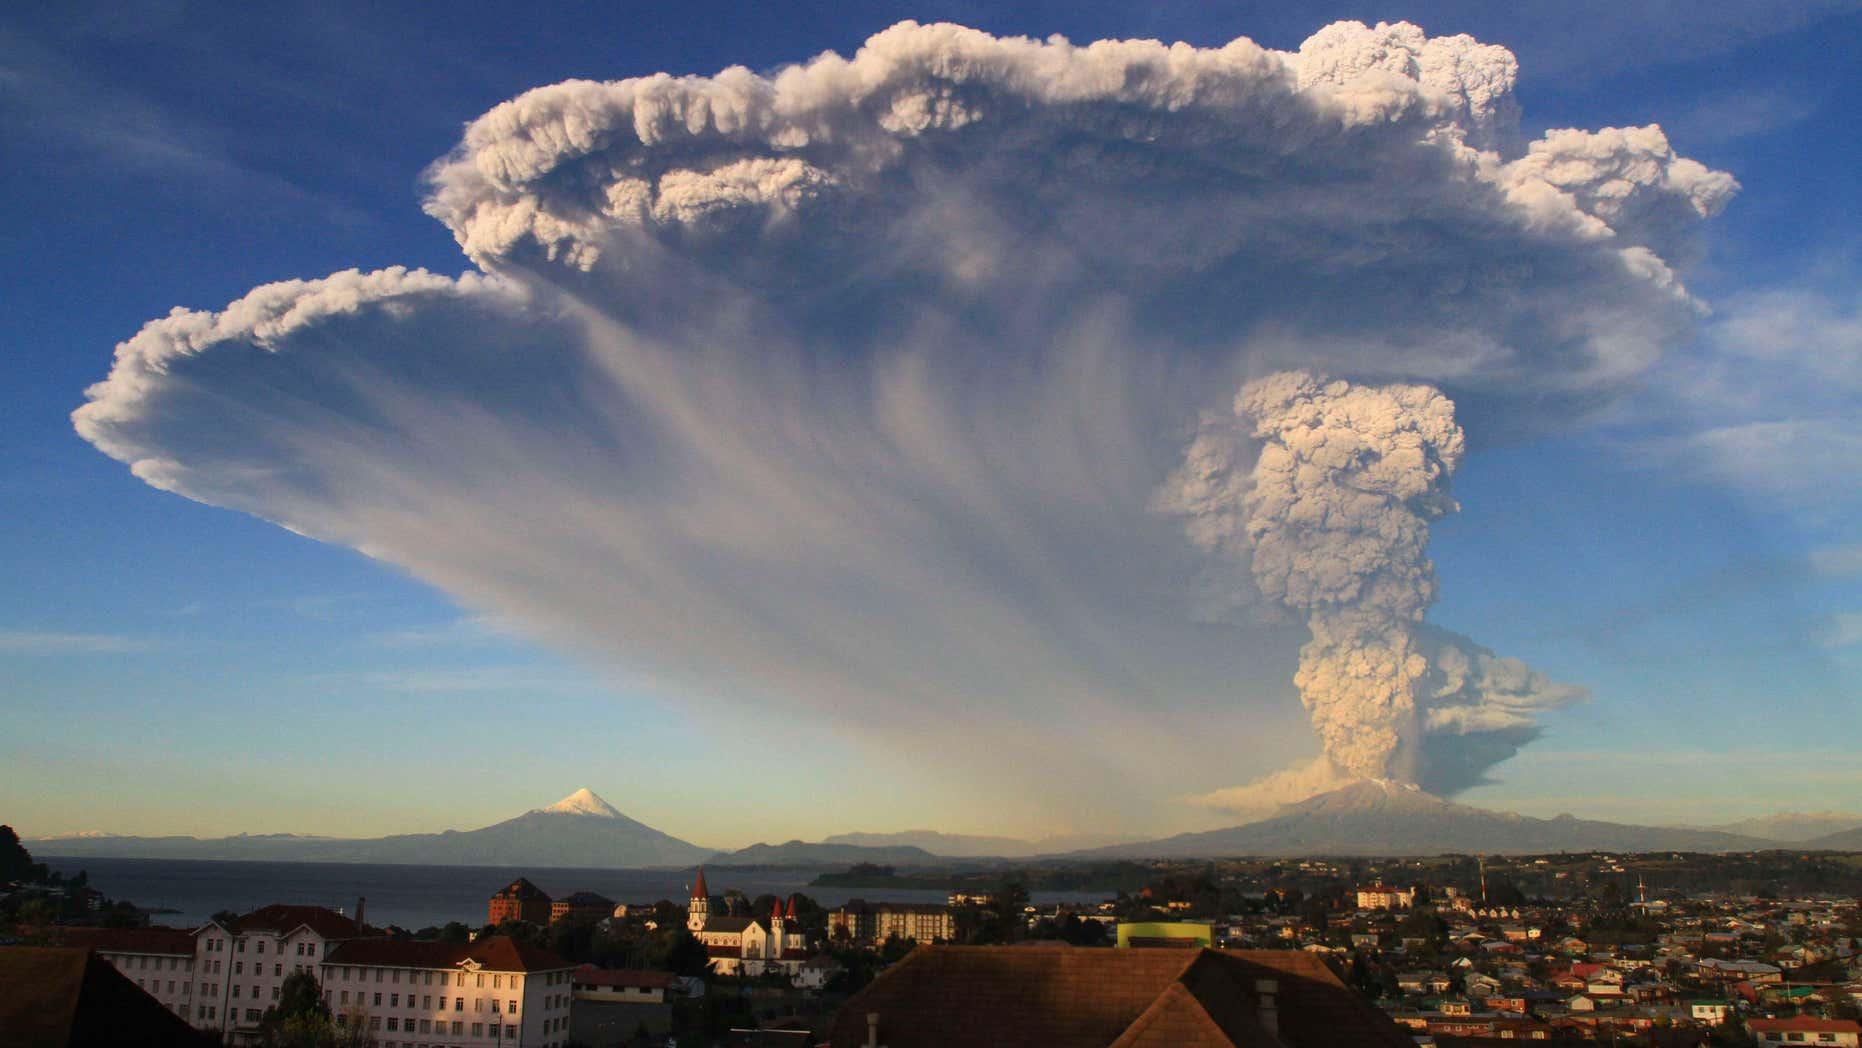 April 22, 2015: The Calbuco volcano erupts near Puerto Varas, Chile.